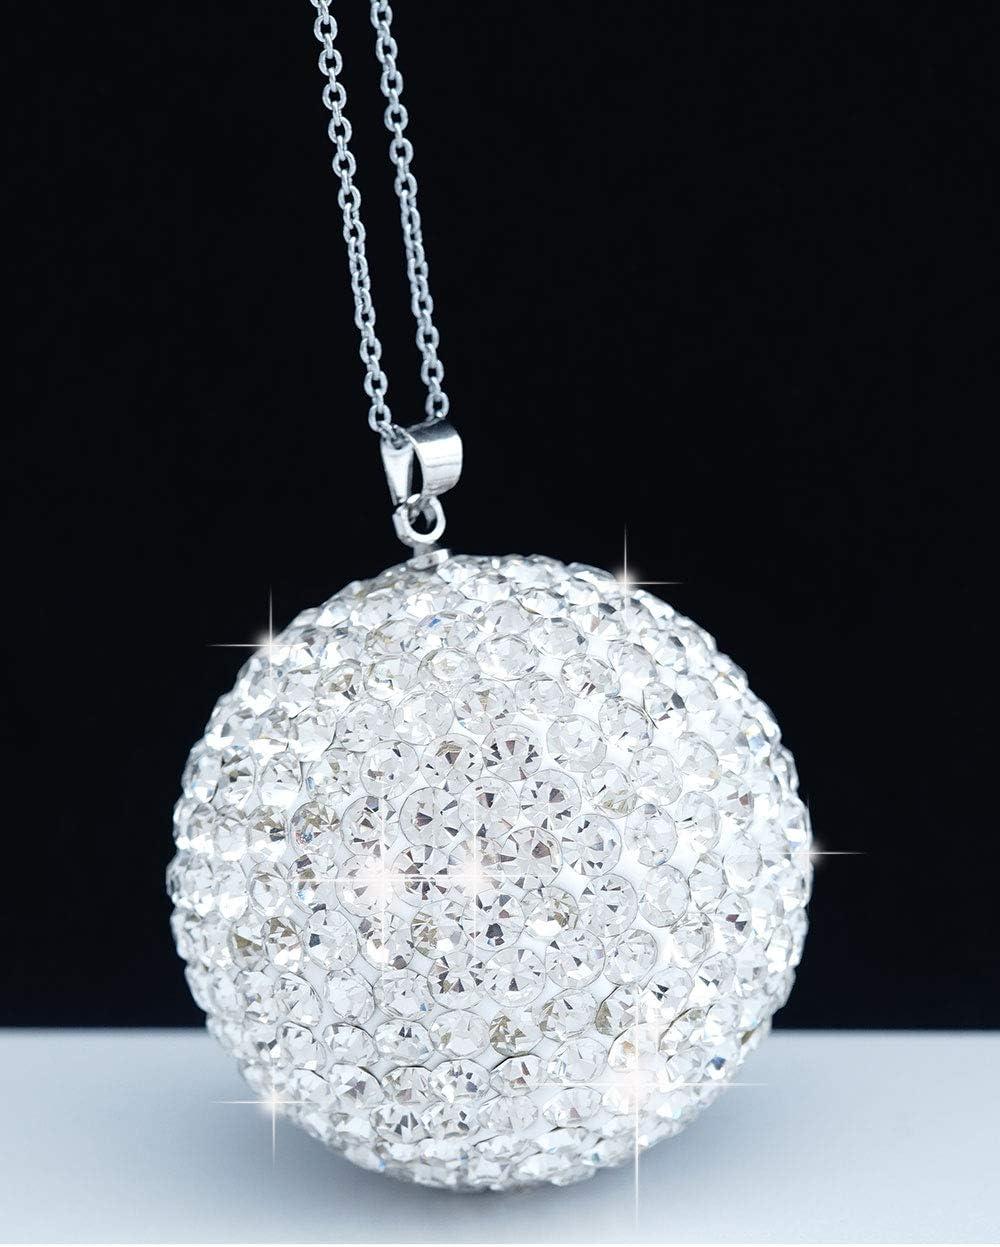 New Diamond Fox Bling Car Crystal Pendant Rearview Mirror Accessory Interior